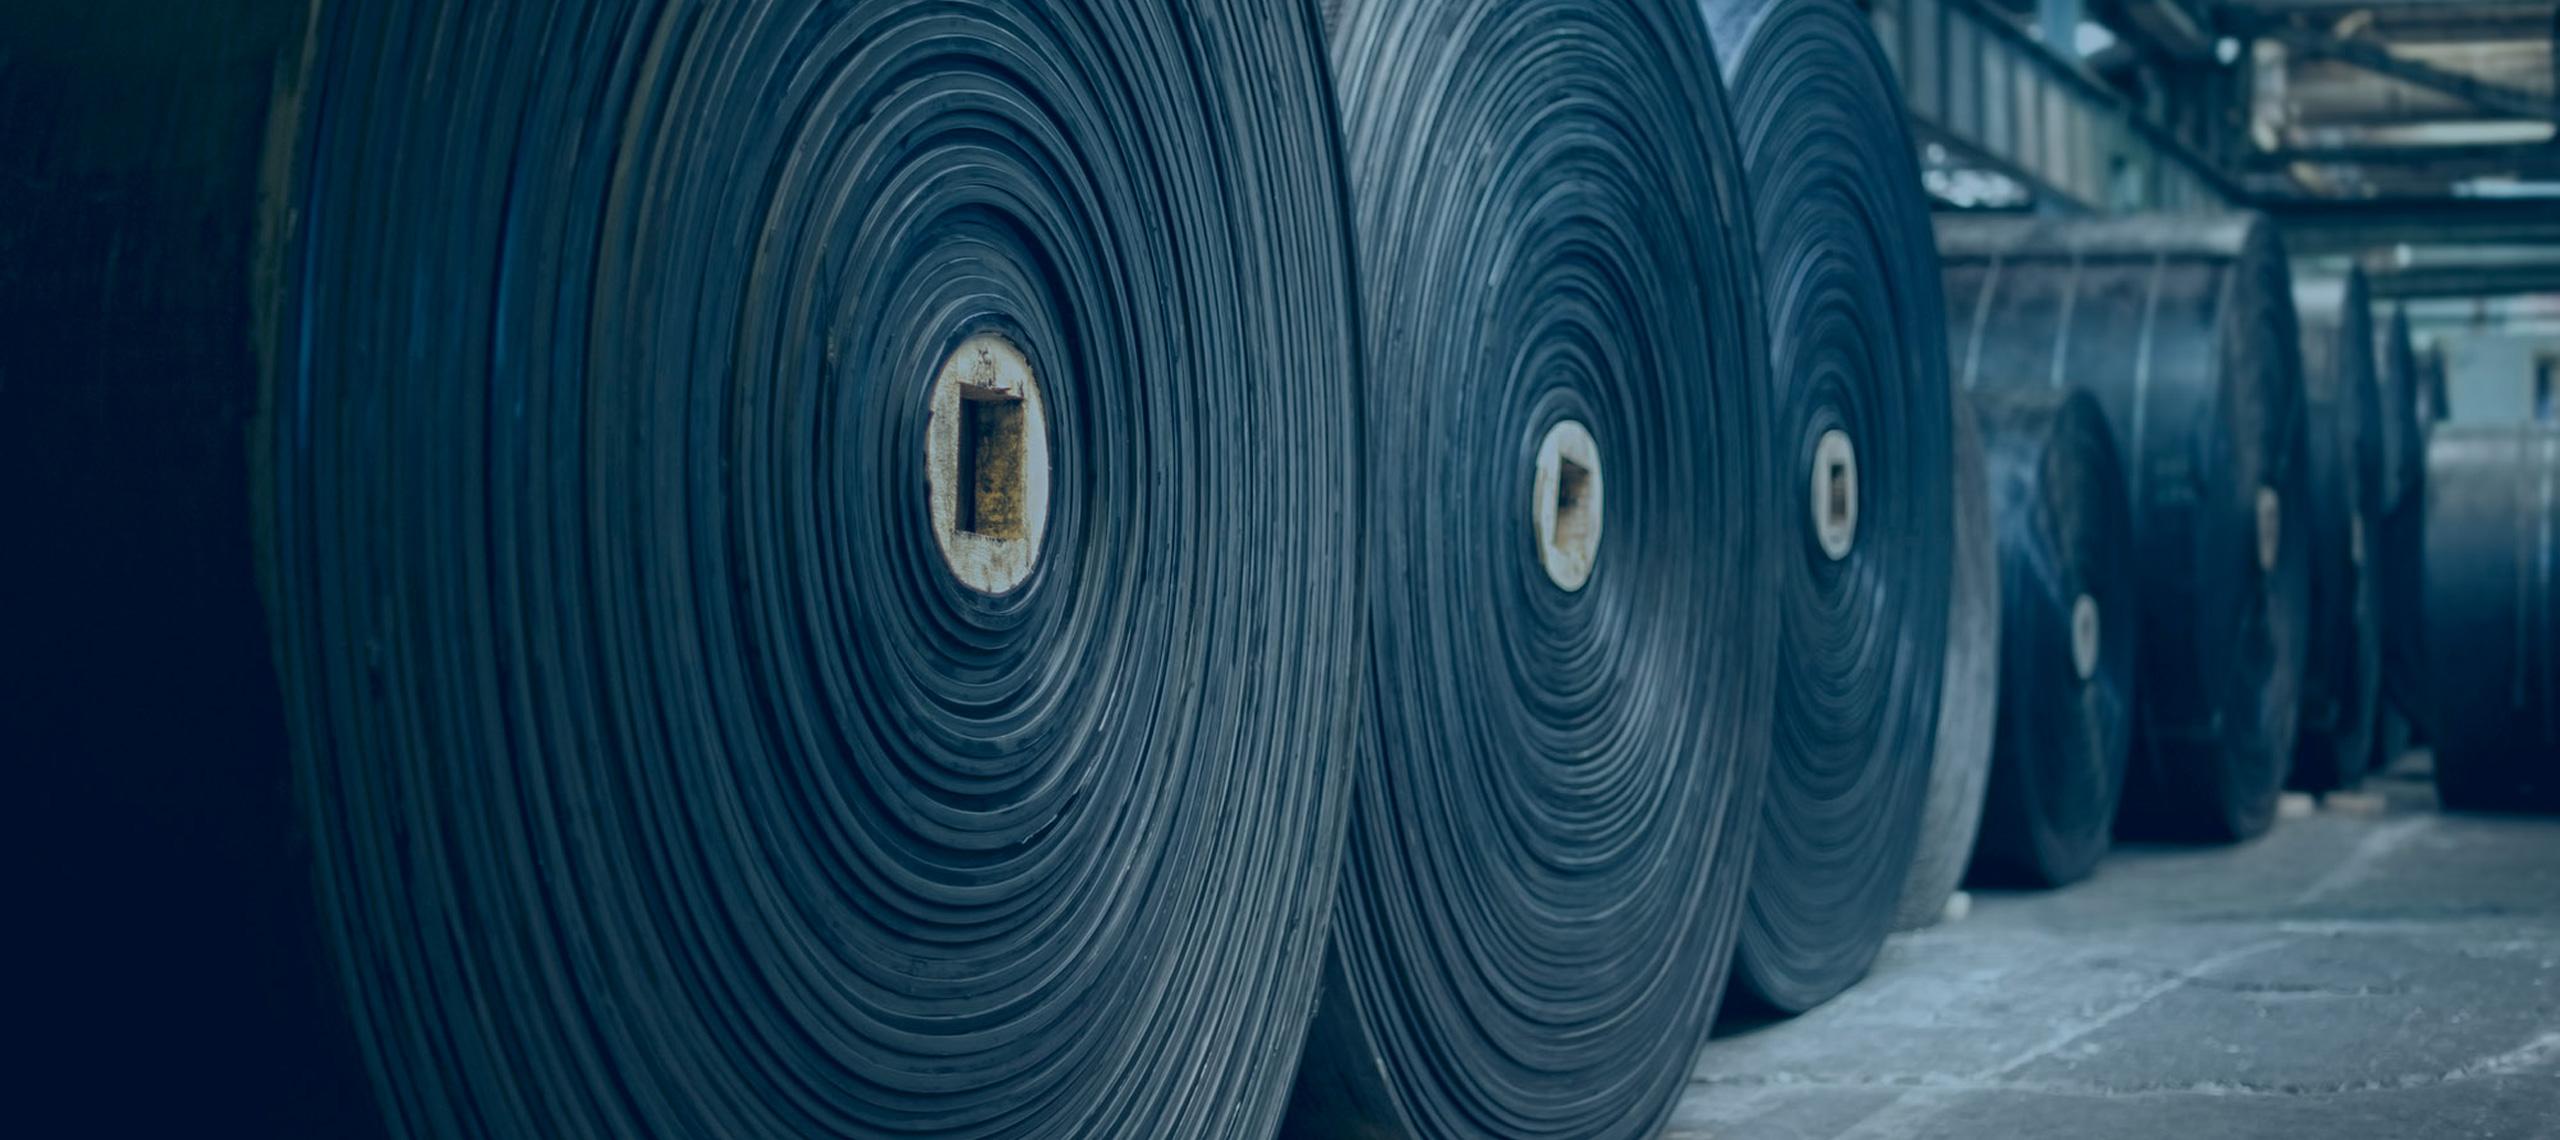 ARABPLAST 2015 - International Plastics and Rubber Industry Trade Show